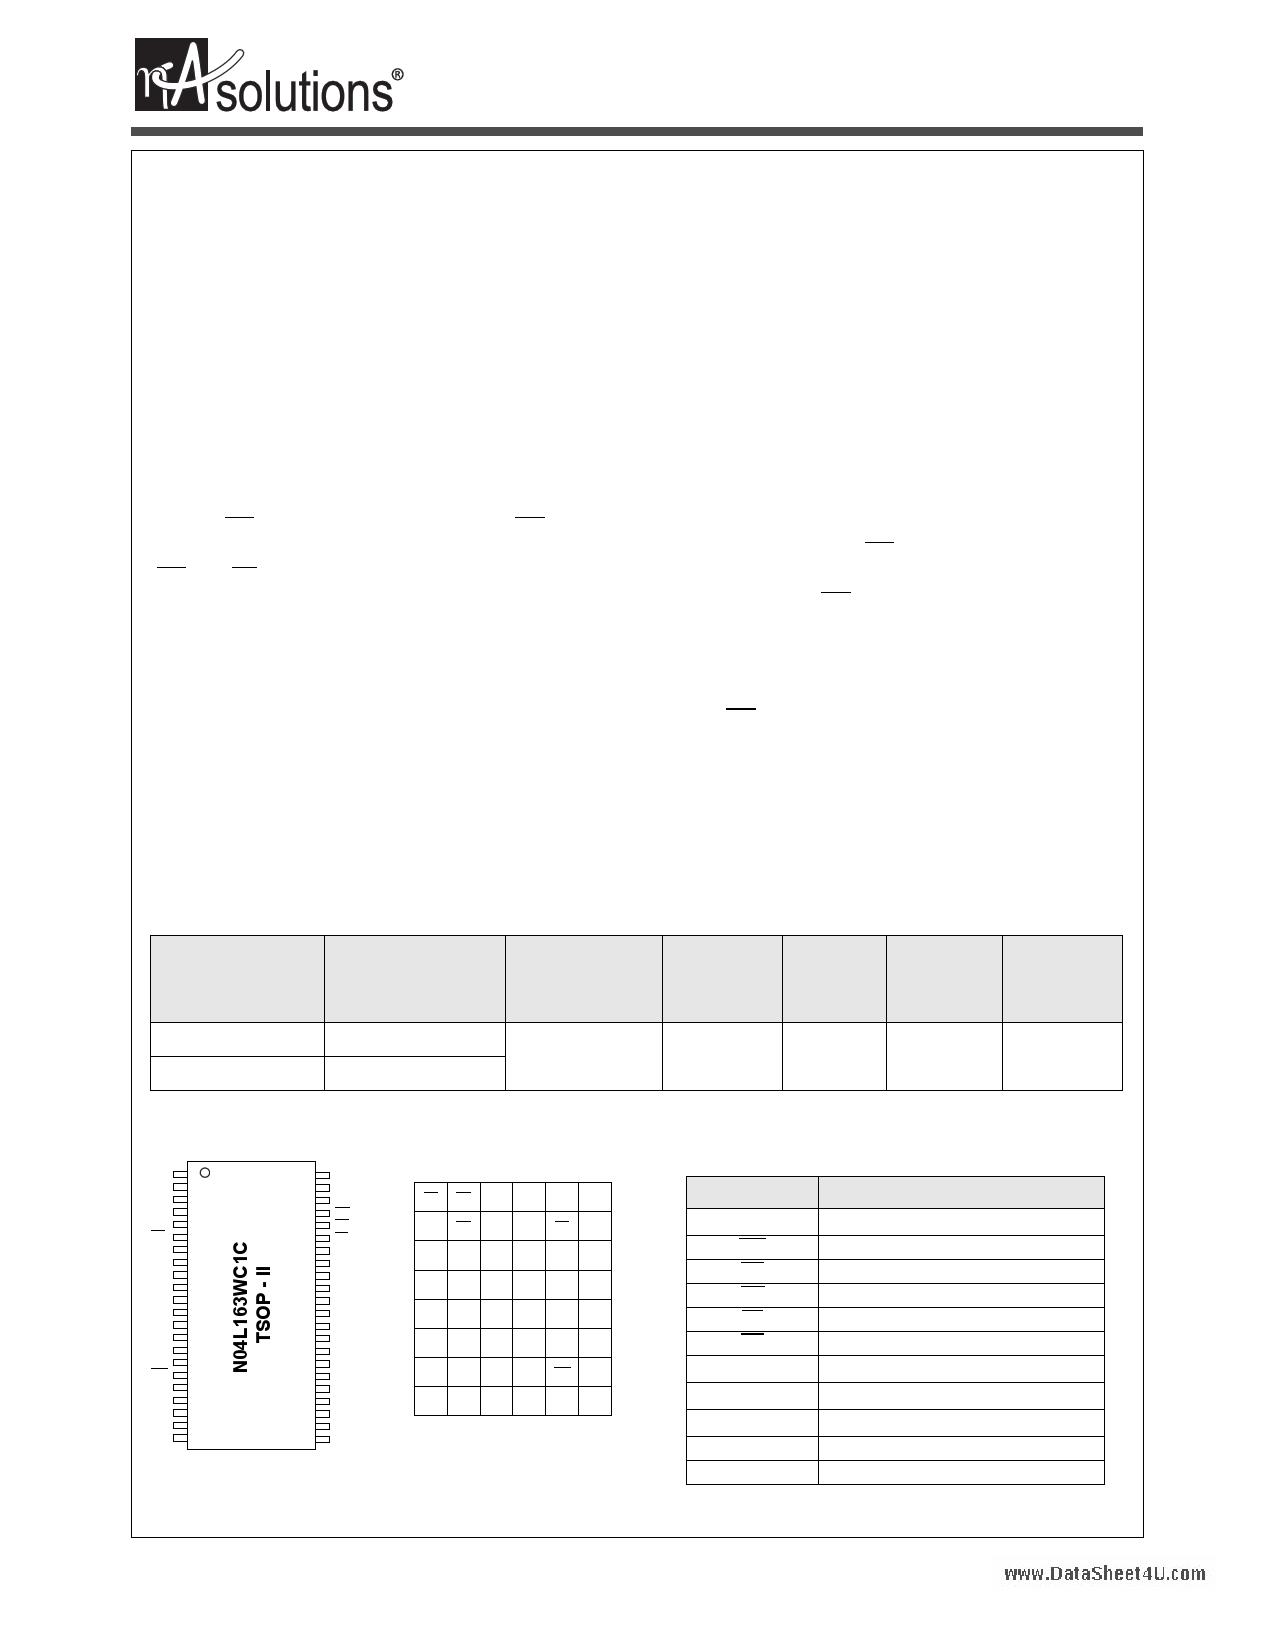 N04L163WC1C دیتاشیت PDF